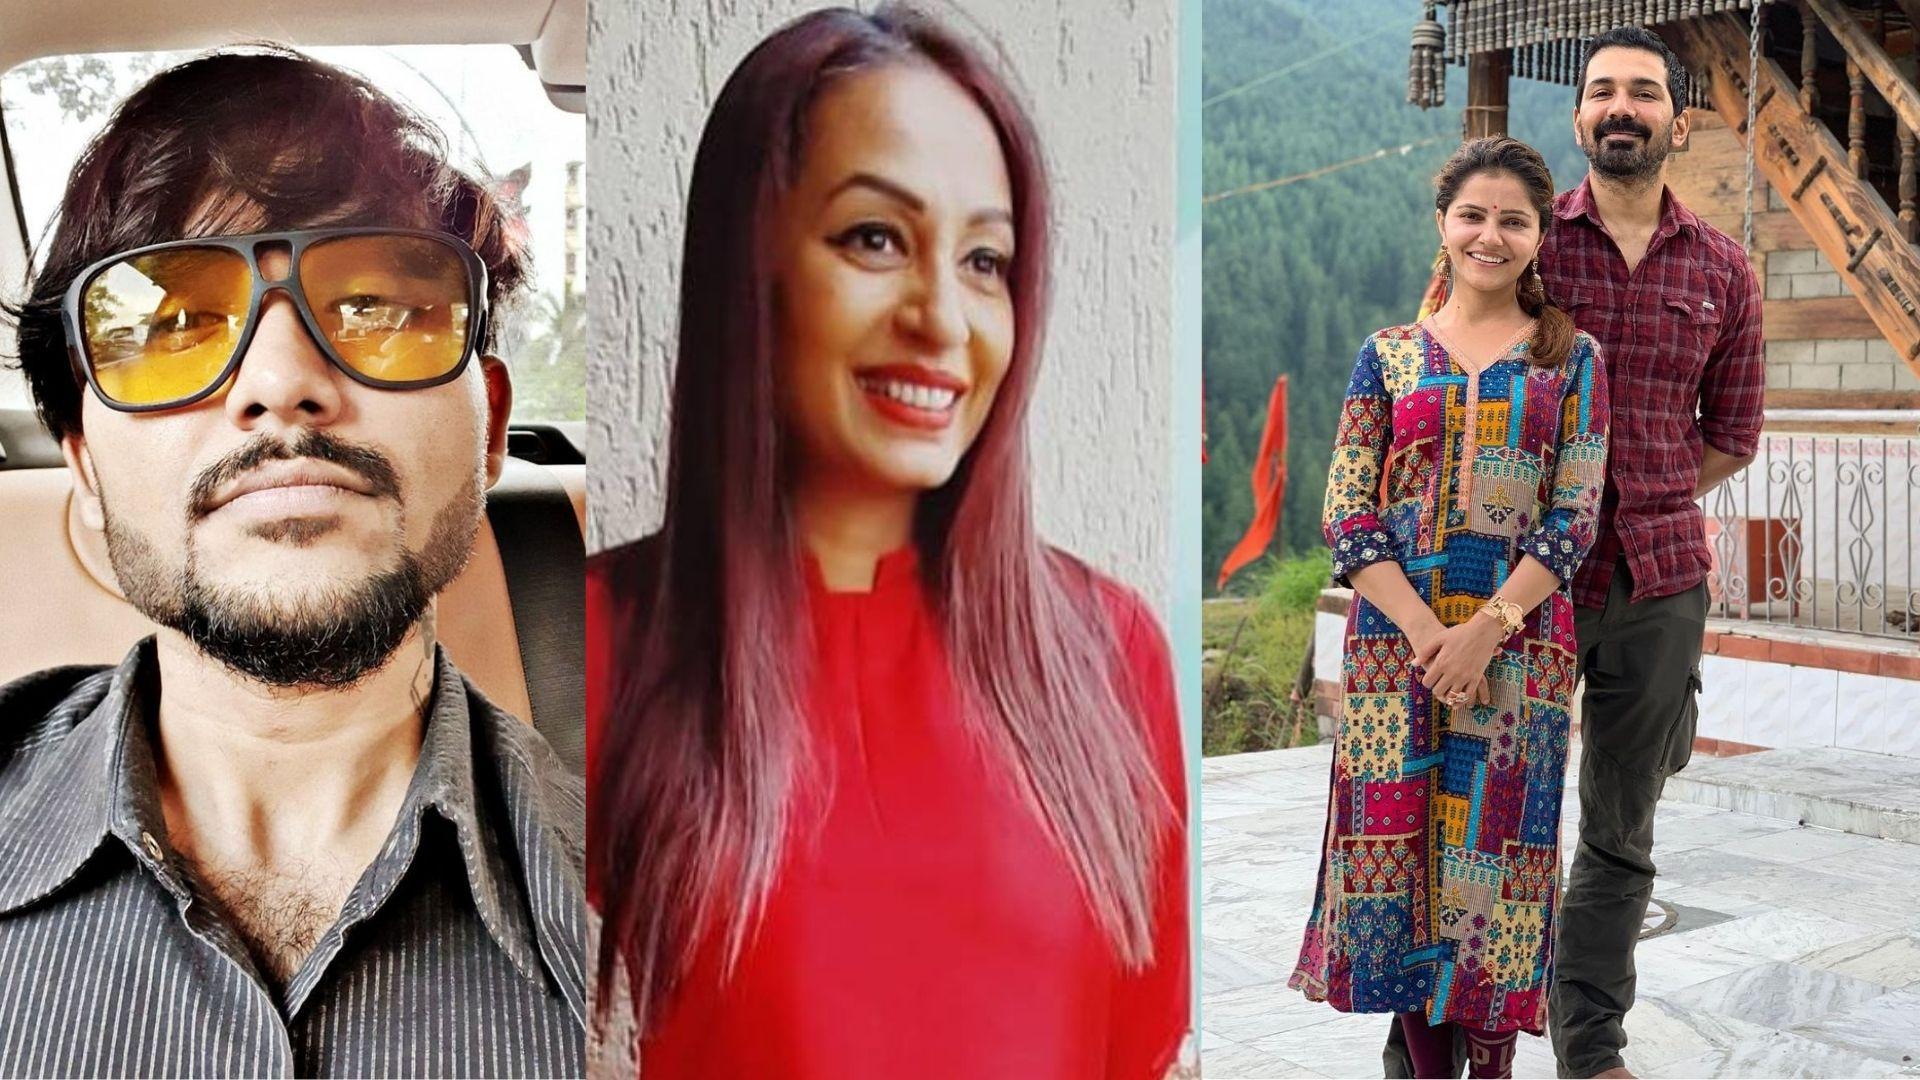 Bigg Boss 15: Former Bigg Boss Contestant Jaan Kumar Sanu Slams Kashmera Shah For Bashing Rubina Dilaik And Abhinav Shukla